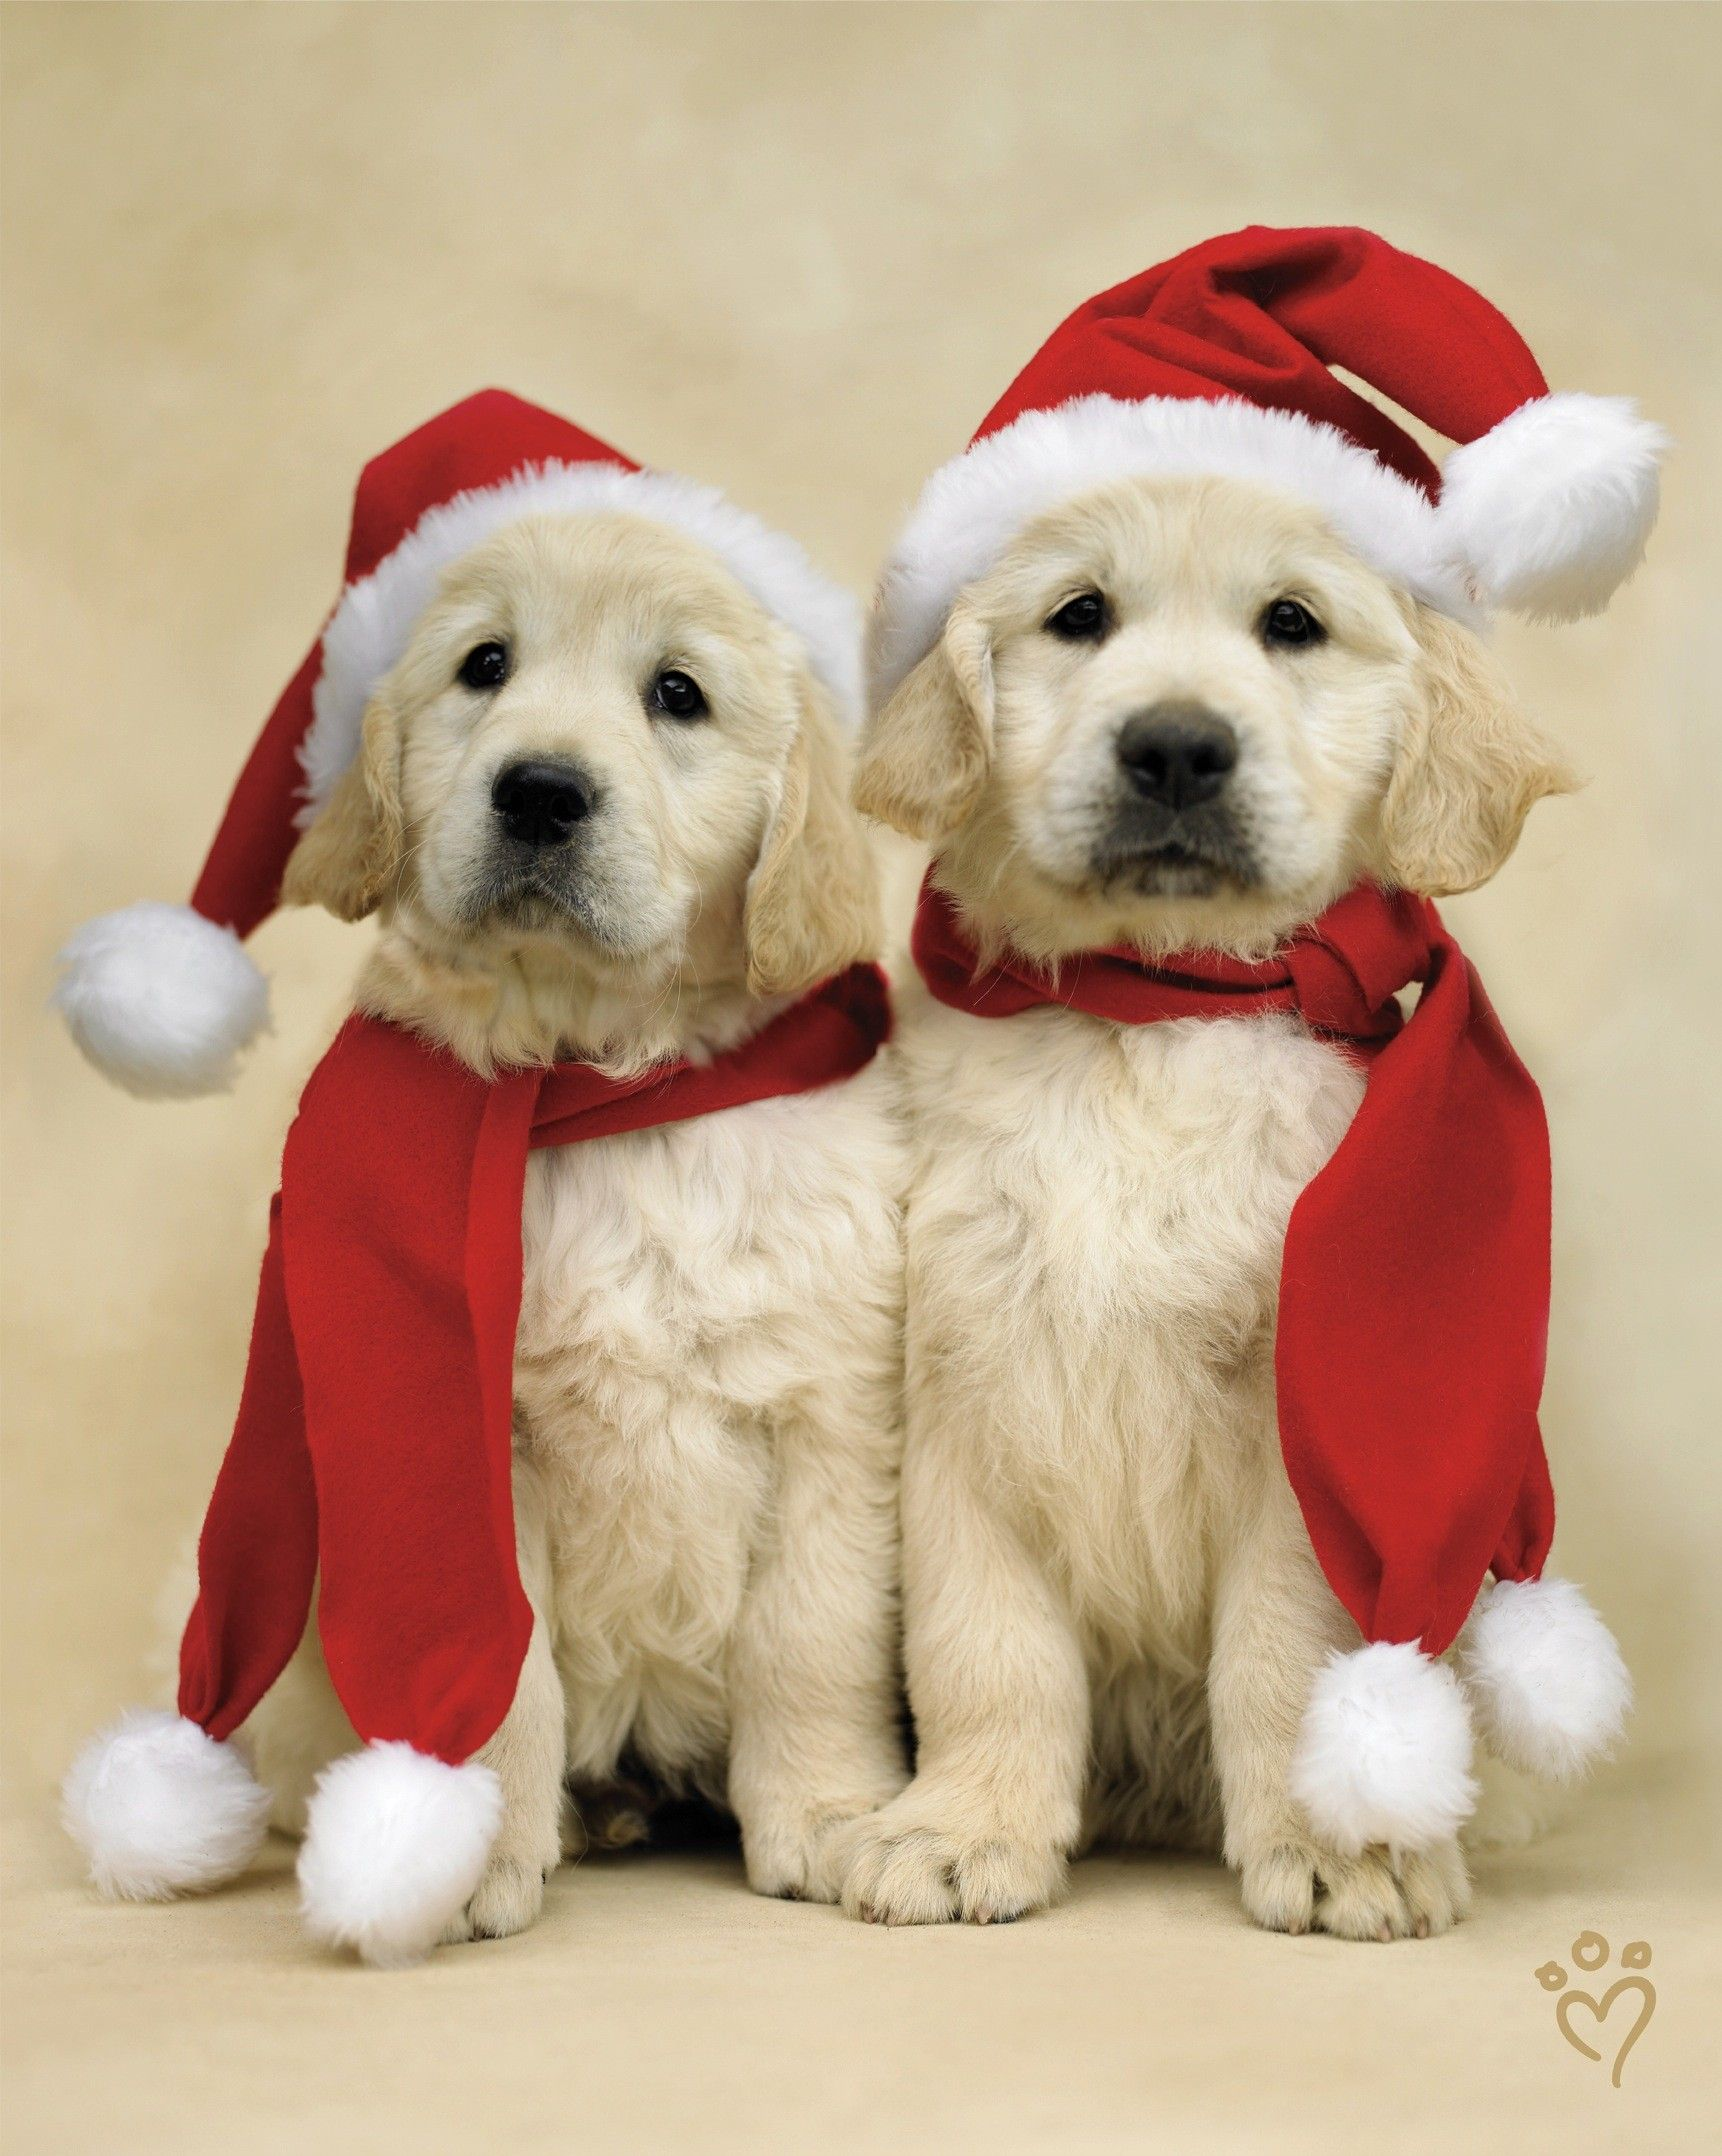 Labrador Christmas Hd Christmas Labrador Puppies Pictures And Wallpapers Christmas Animals Christmas Puppy Christmas Dog